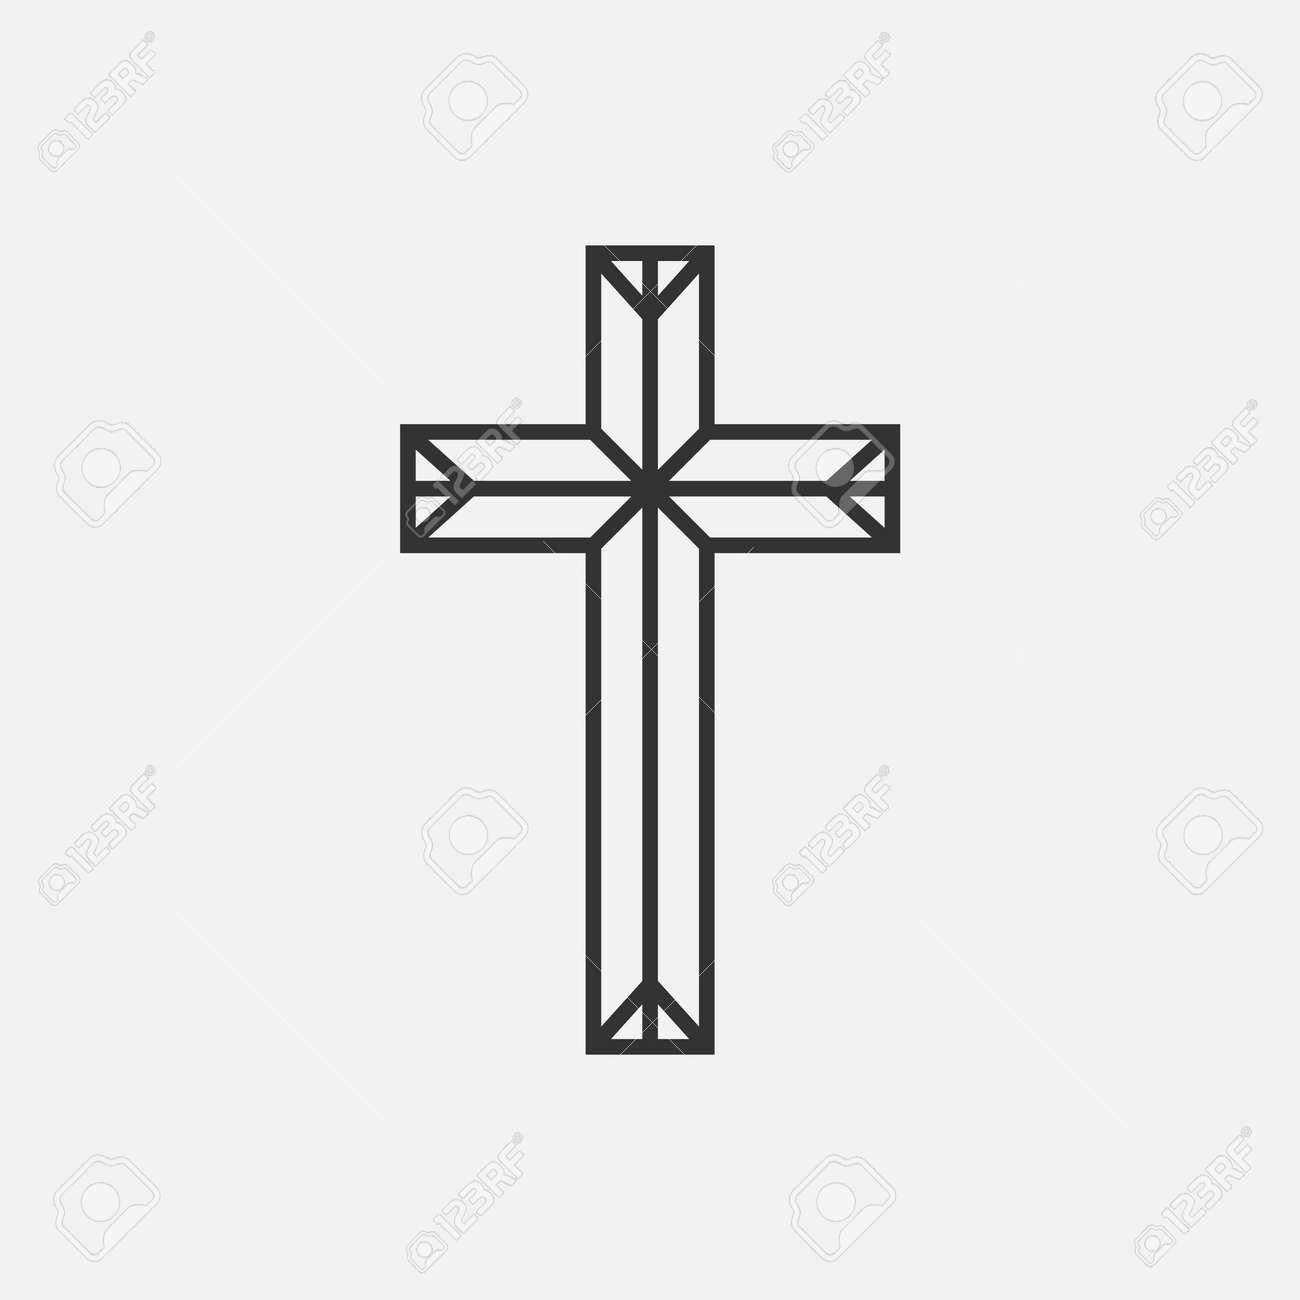 Christian Cross icon app, UI. Vector illustration. - 164871977